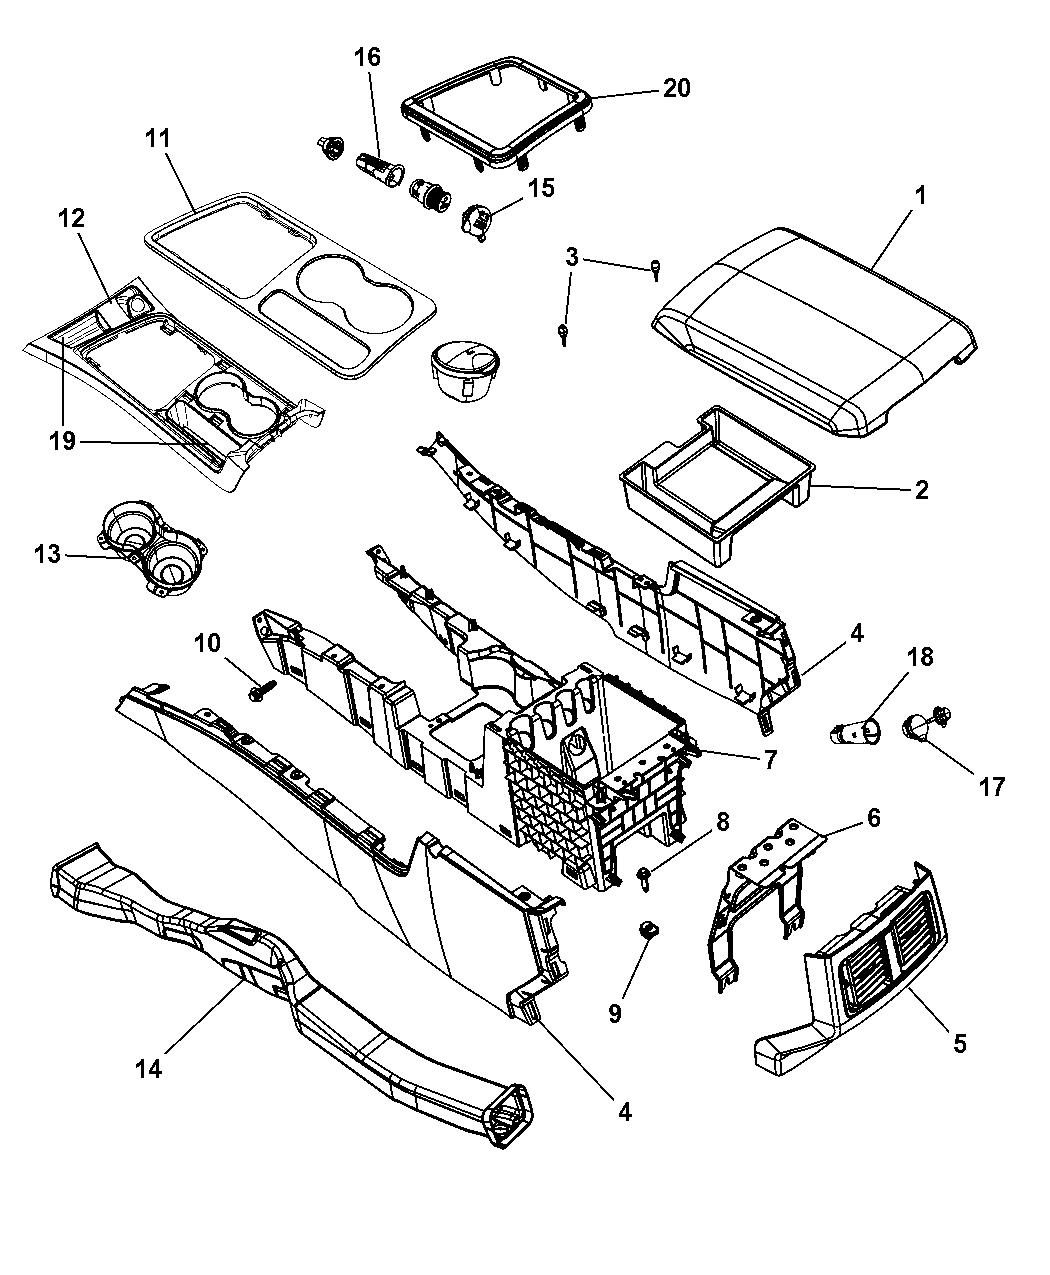 1rq591glaa Genuine Mopar Armrest Console